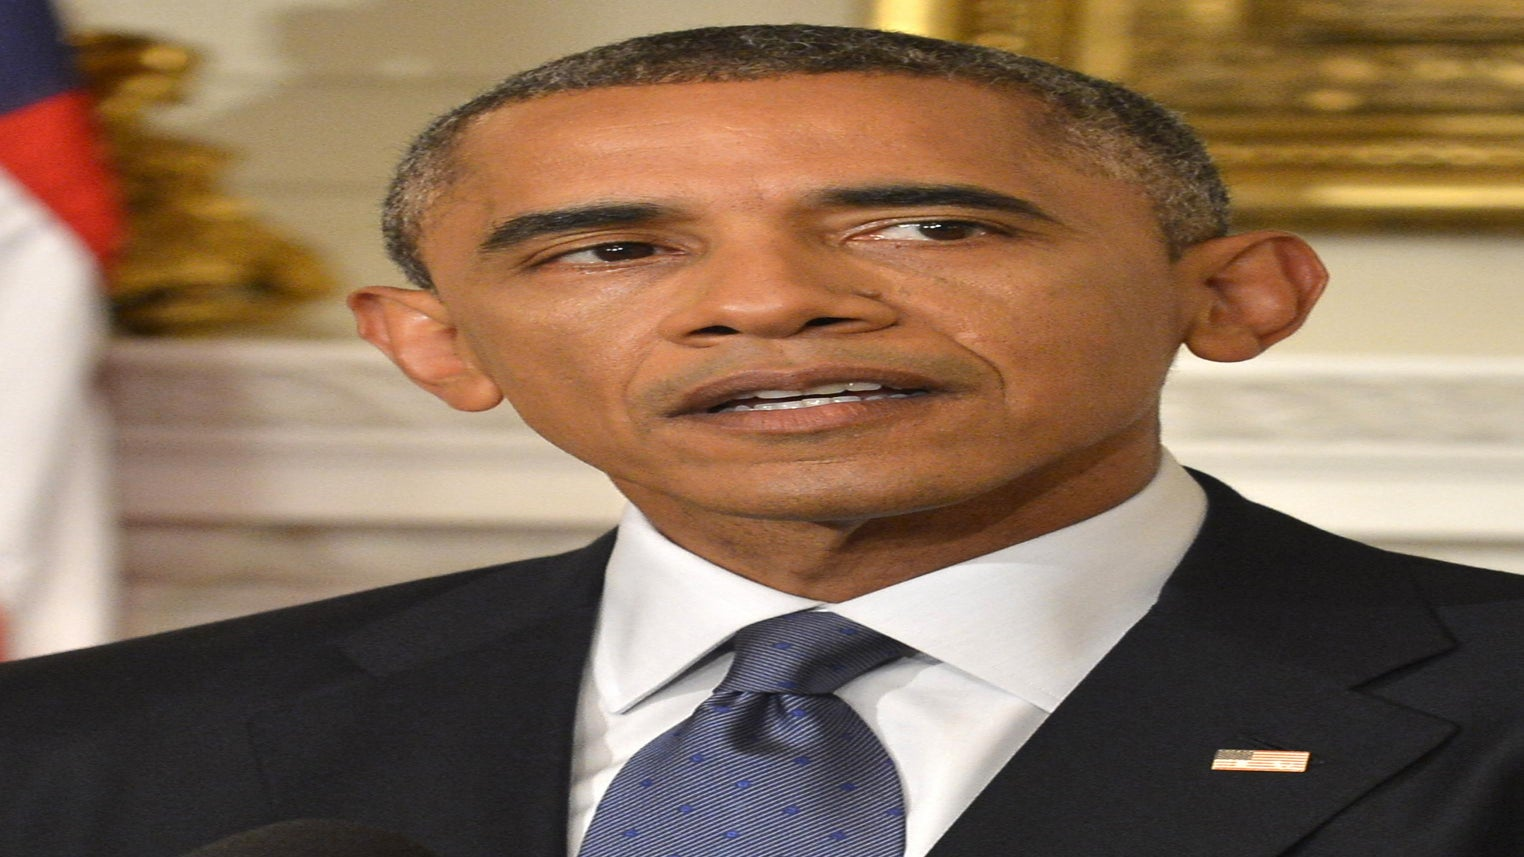 President Obama Praises University of Missouri Student Activists